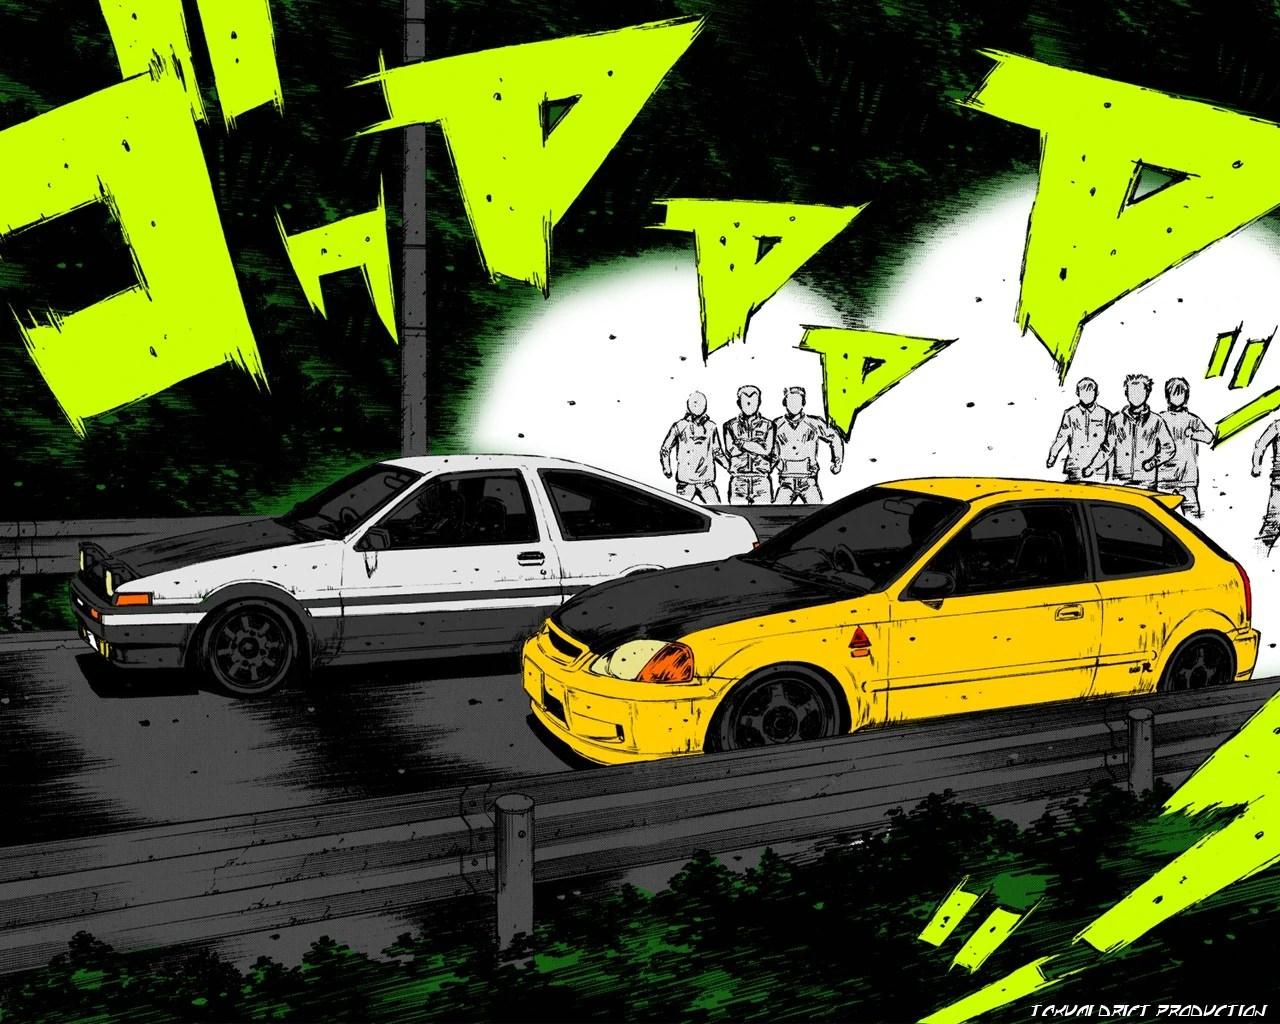 Car Phone Wallpaper Rx7 画像 頭文字d壁紙につかえる画像まとめ Naver まとめ